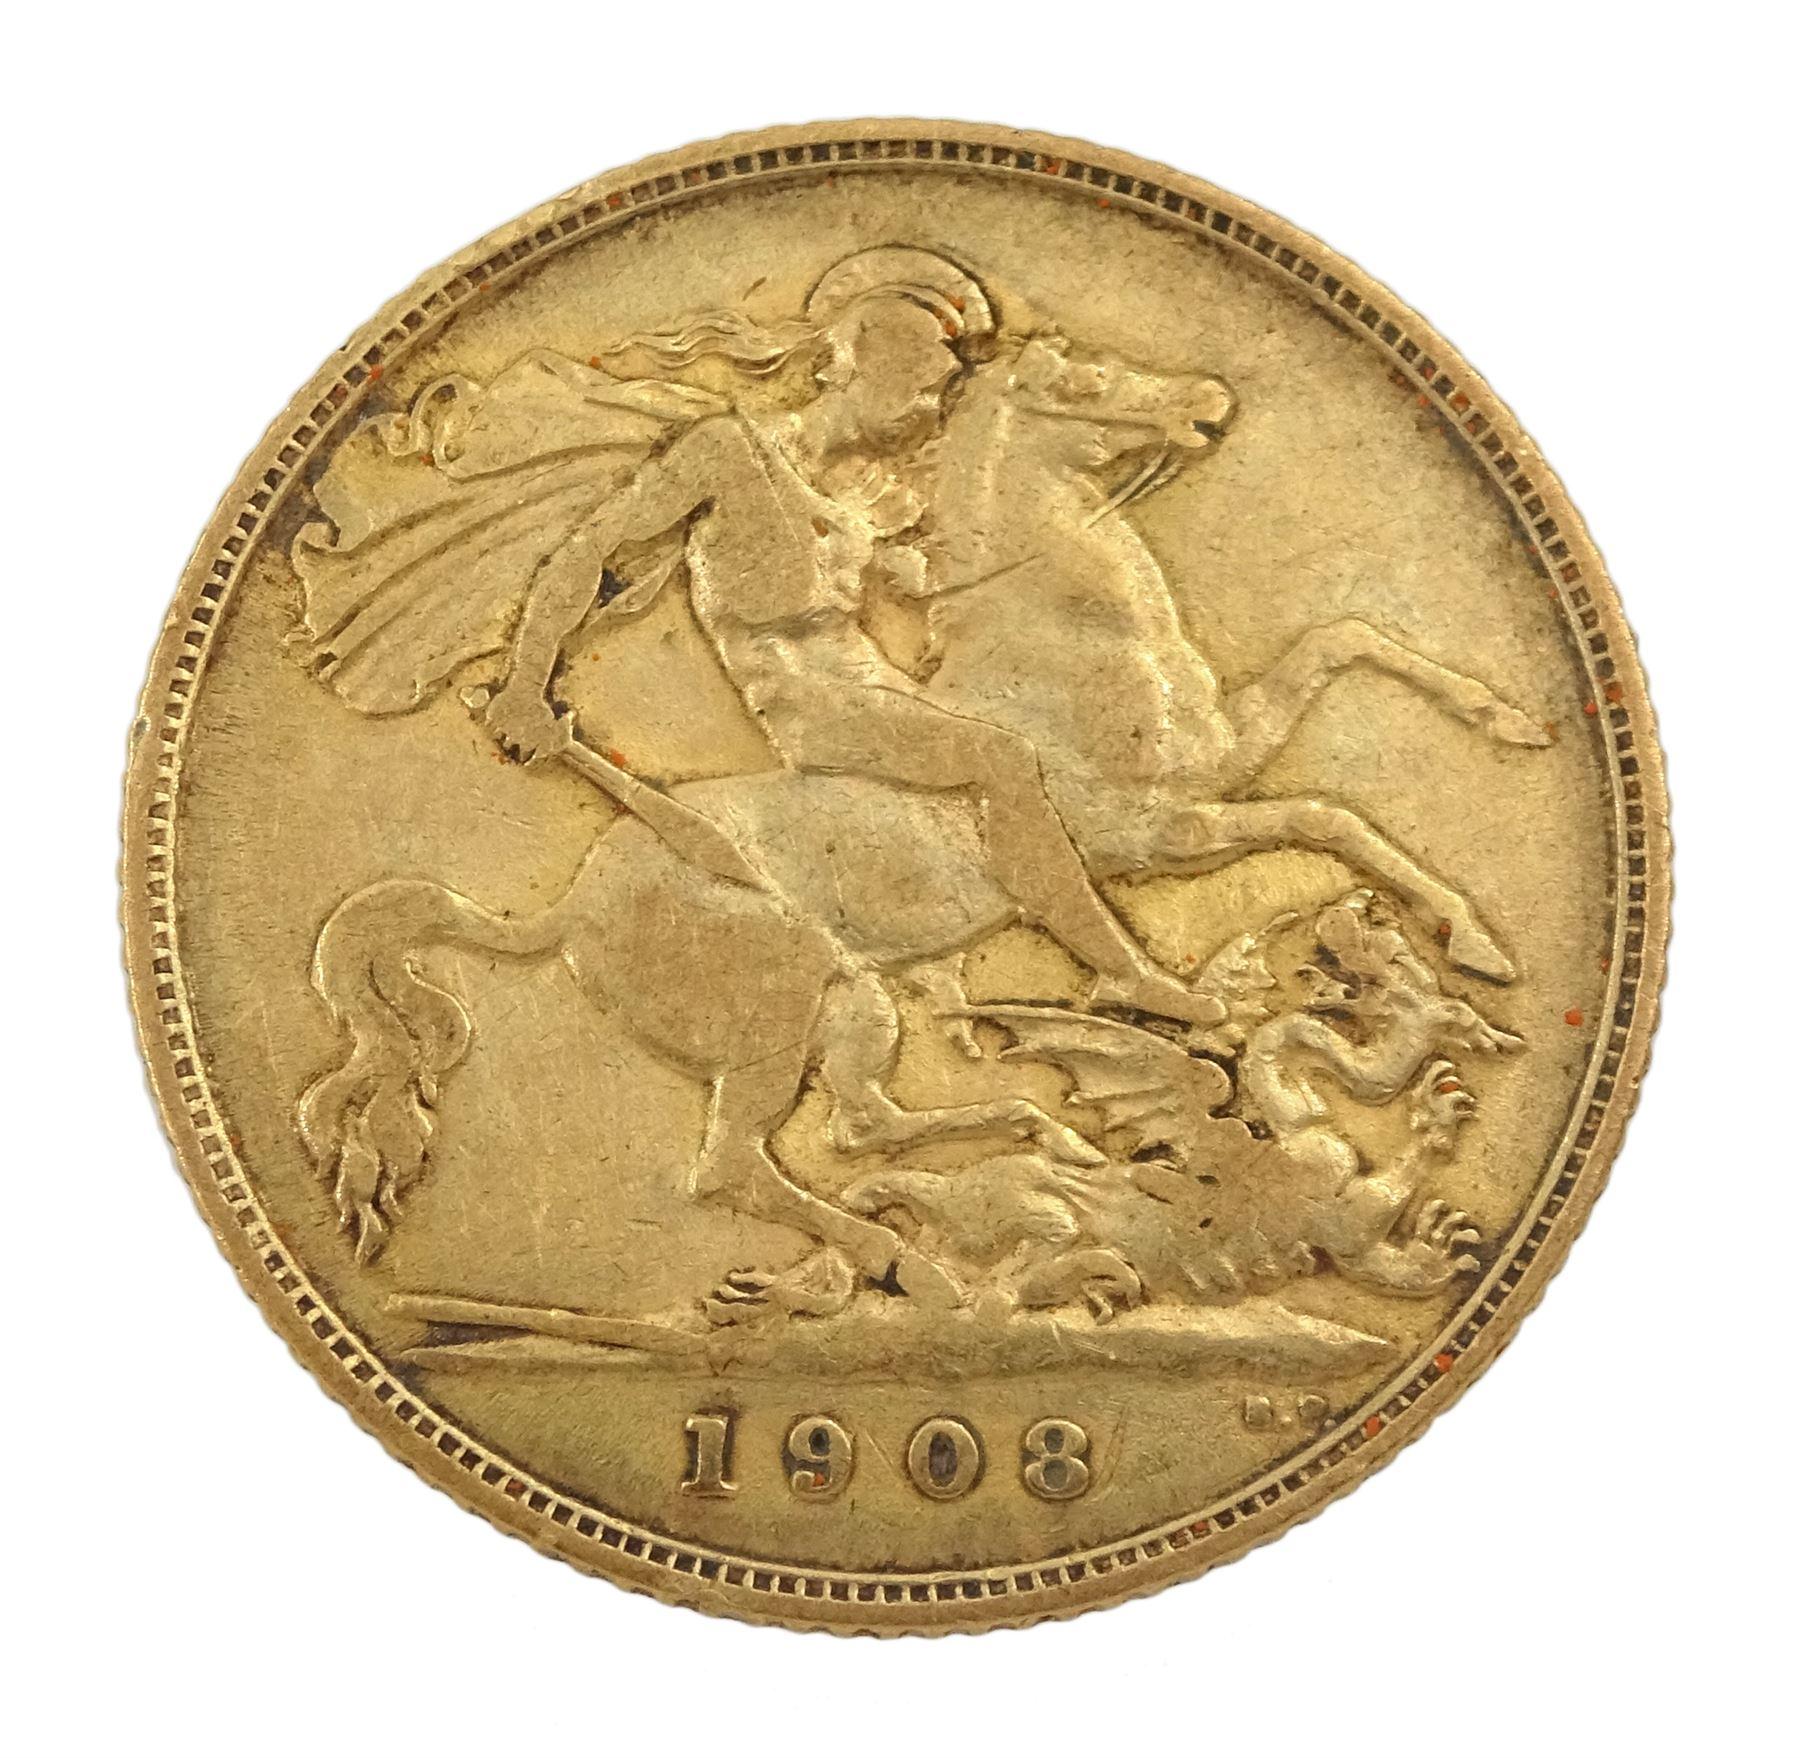 King Edward VII 1908 gold half sovereign coin - Image 2 of 2